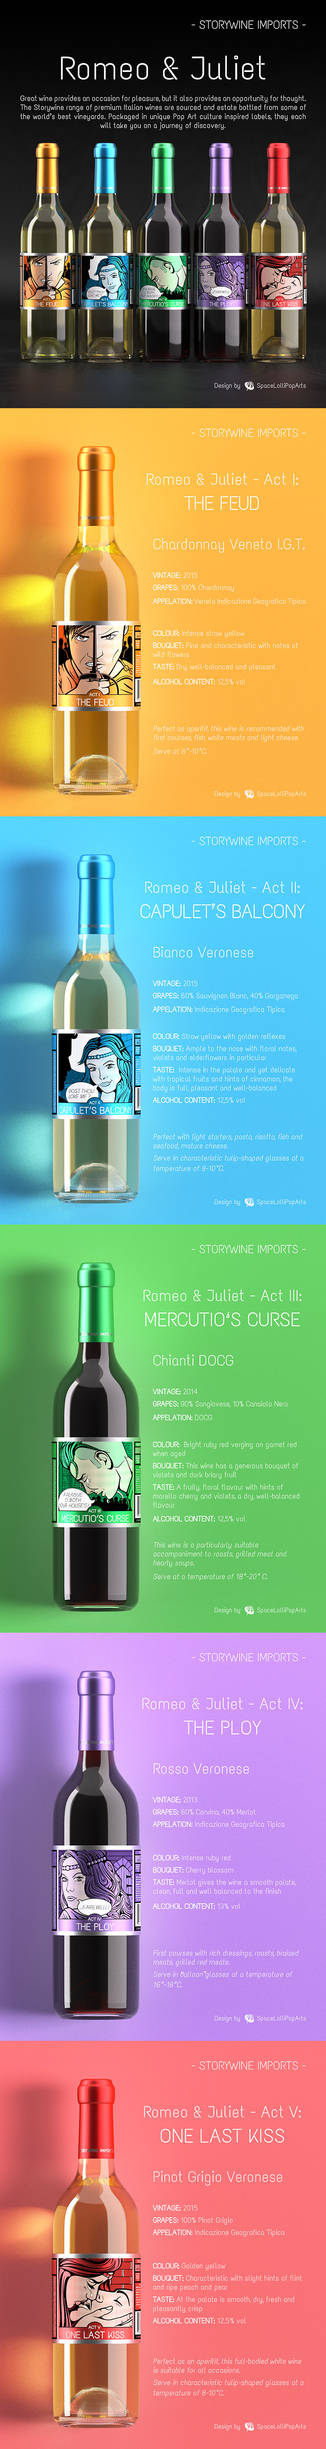 Pop Art Wine Labels Romeo and Juliet